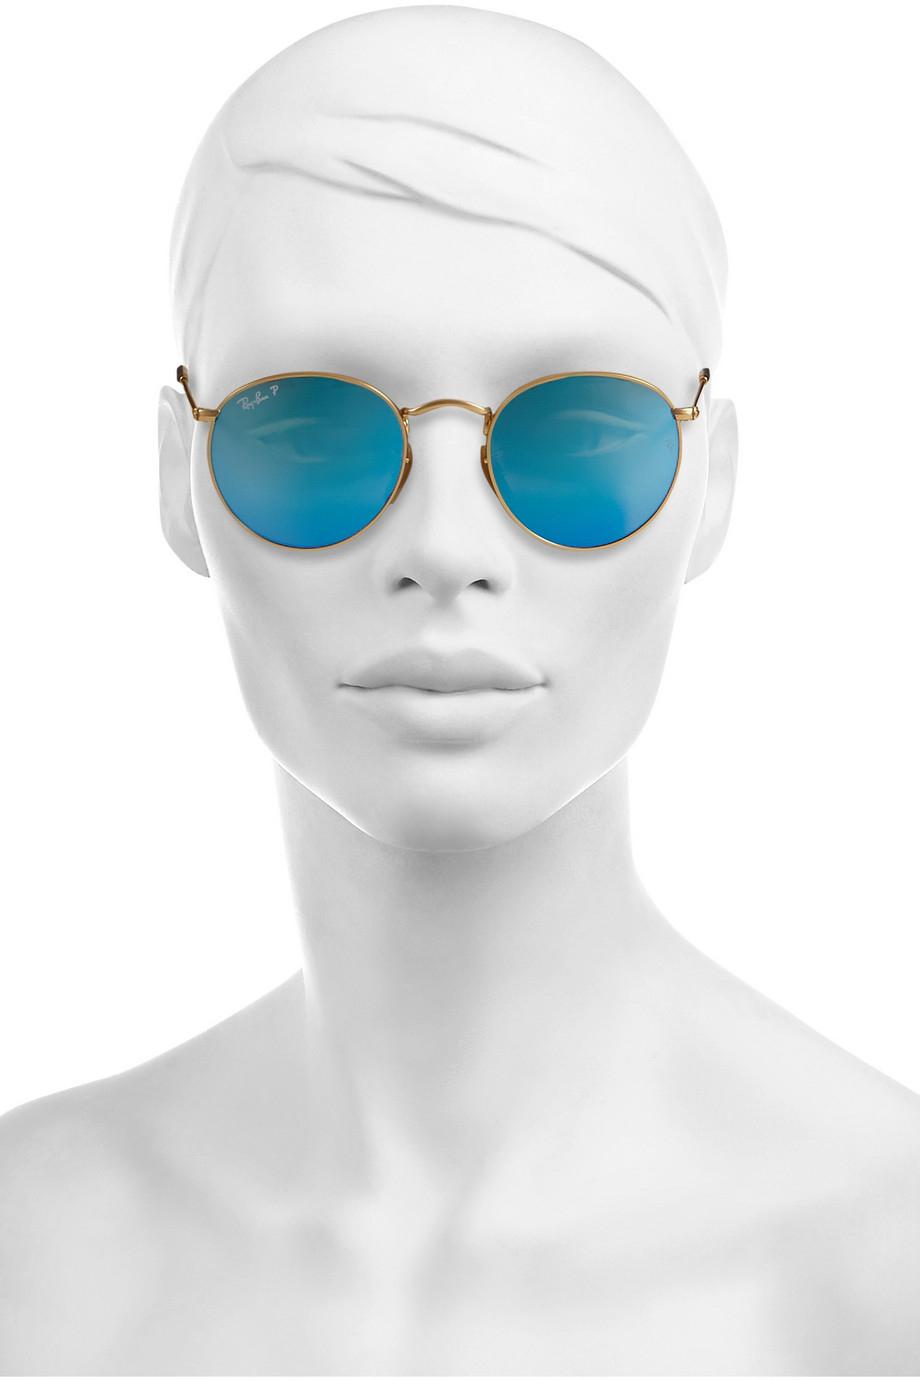 b3da414201 Ray-Ban Round-Frame Gold-Tone Polarized Mirrored Sunglasses in ...